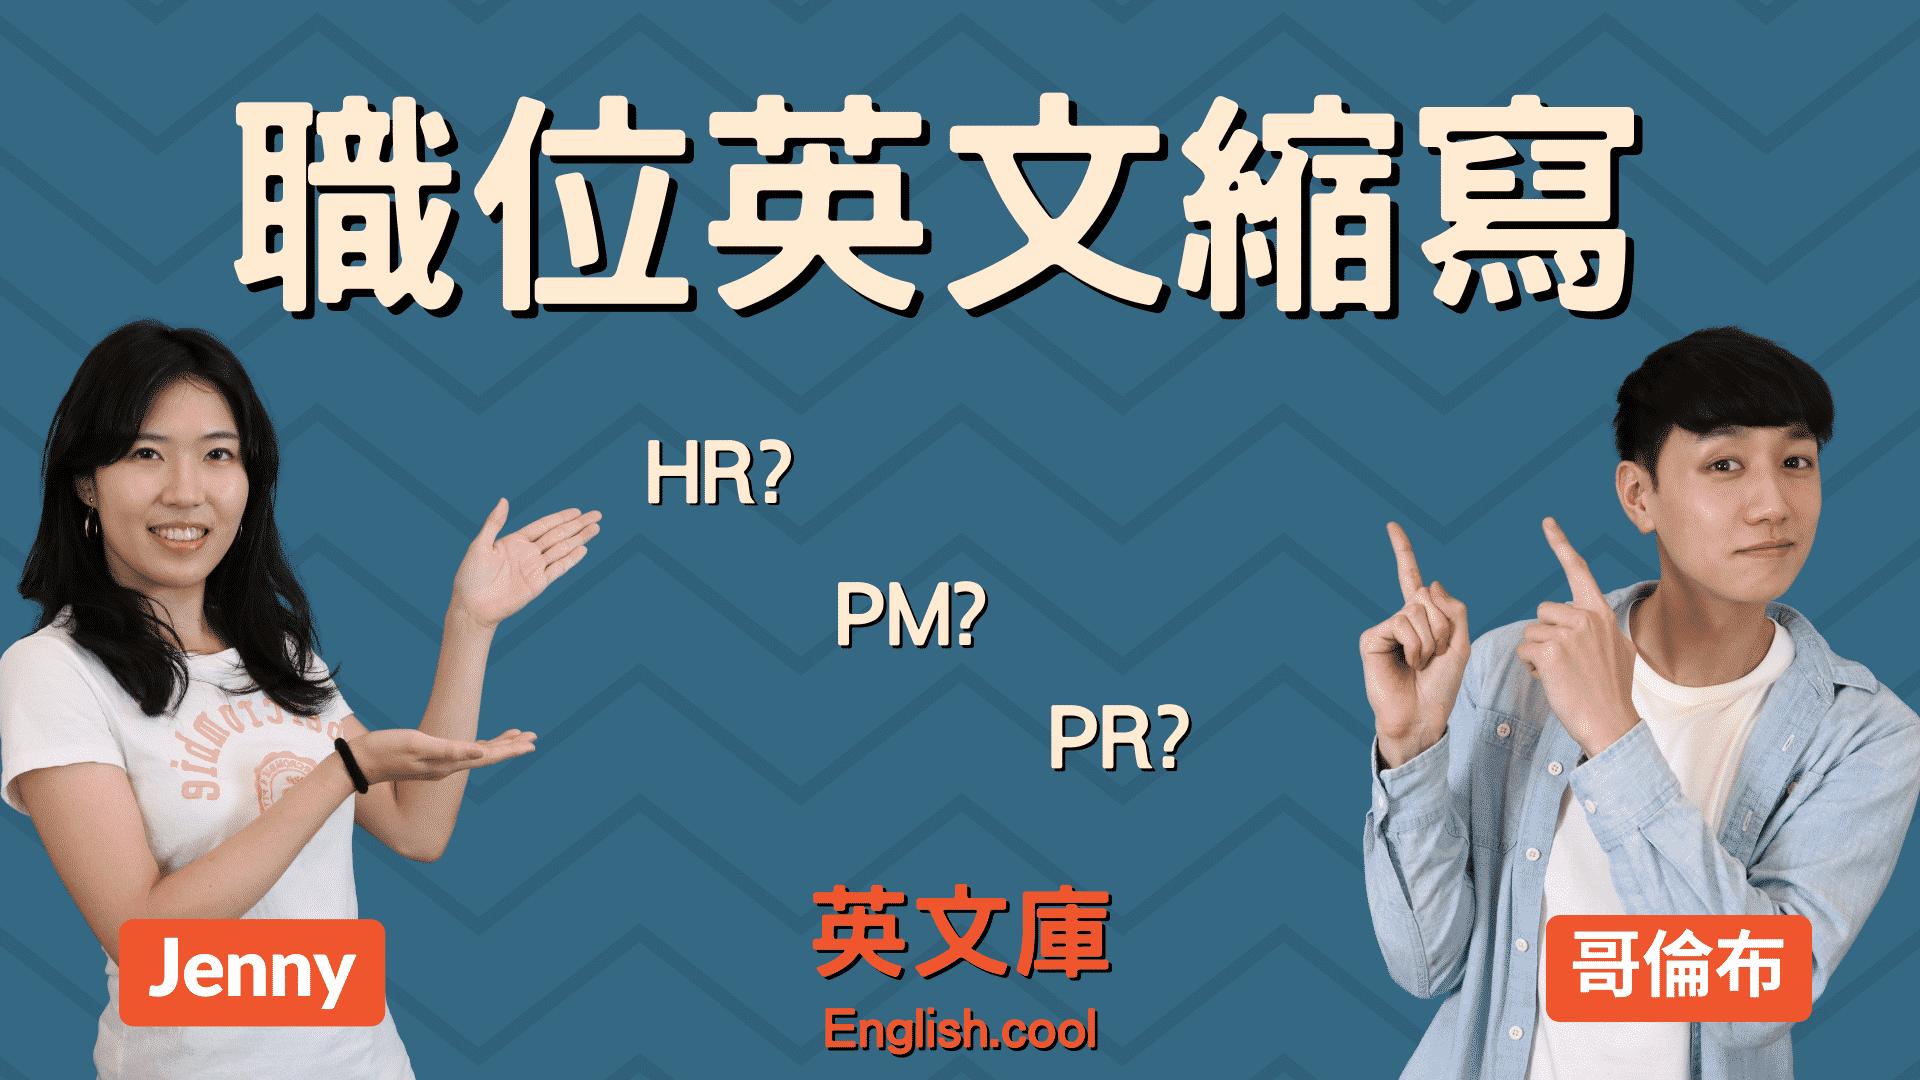 You are currently viewing 【職位縮寫解答】HR? PM? PR? BD? RD?到底什麼意思?